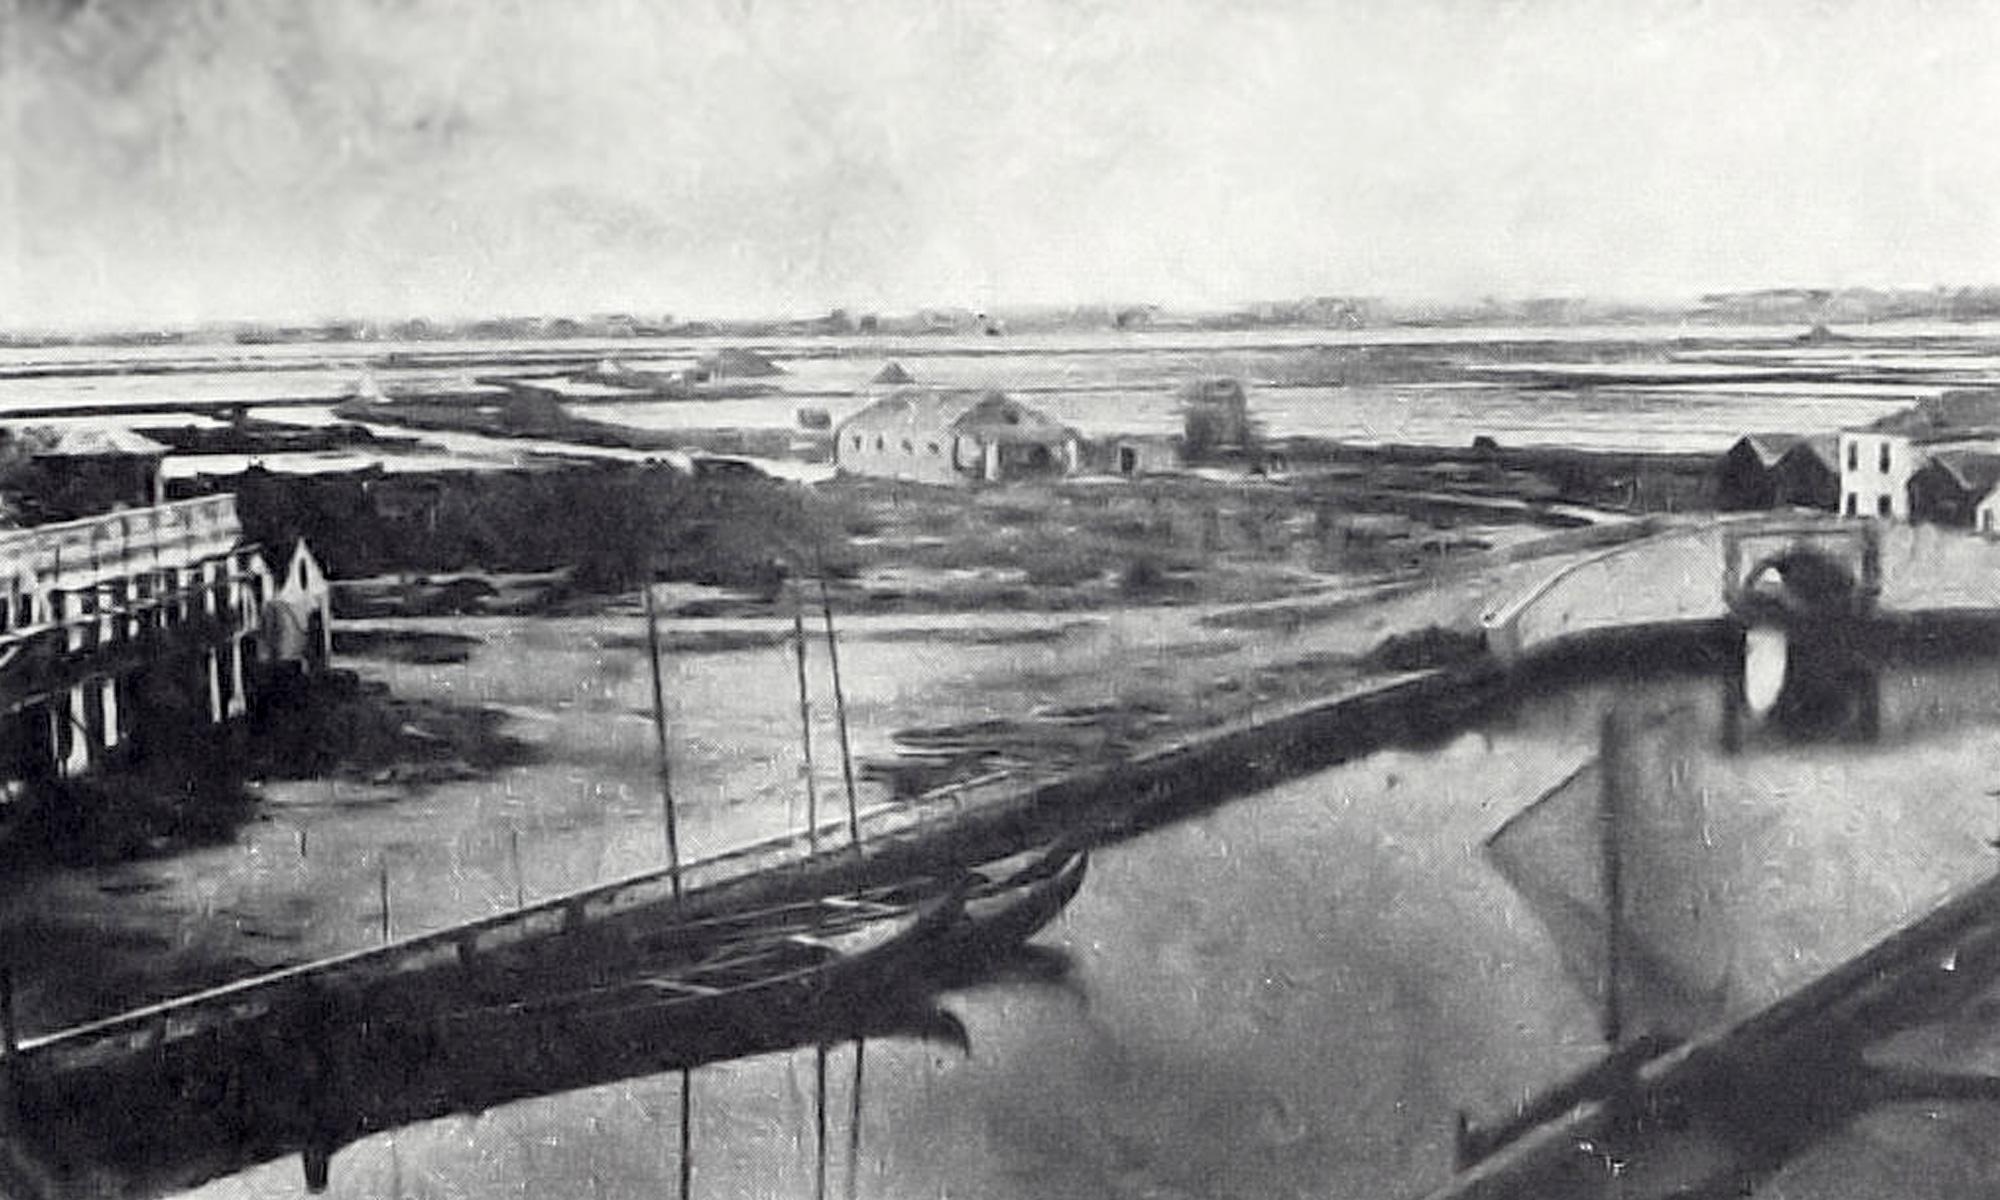 alboi-antigo-aveiro-1880